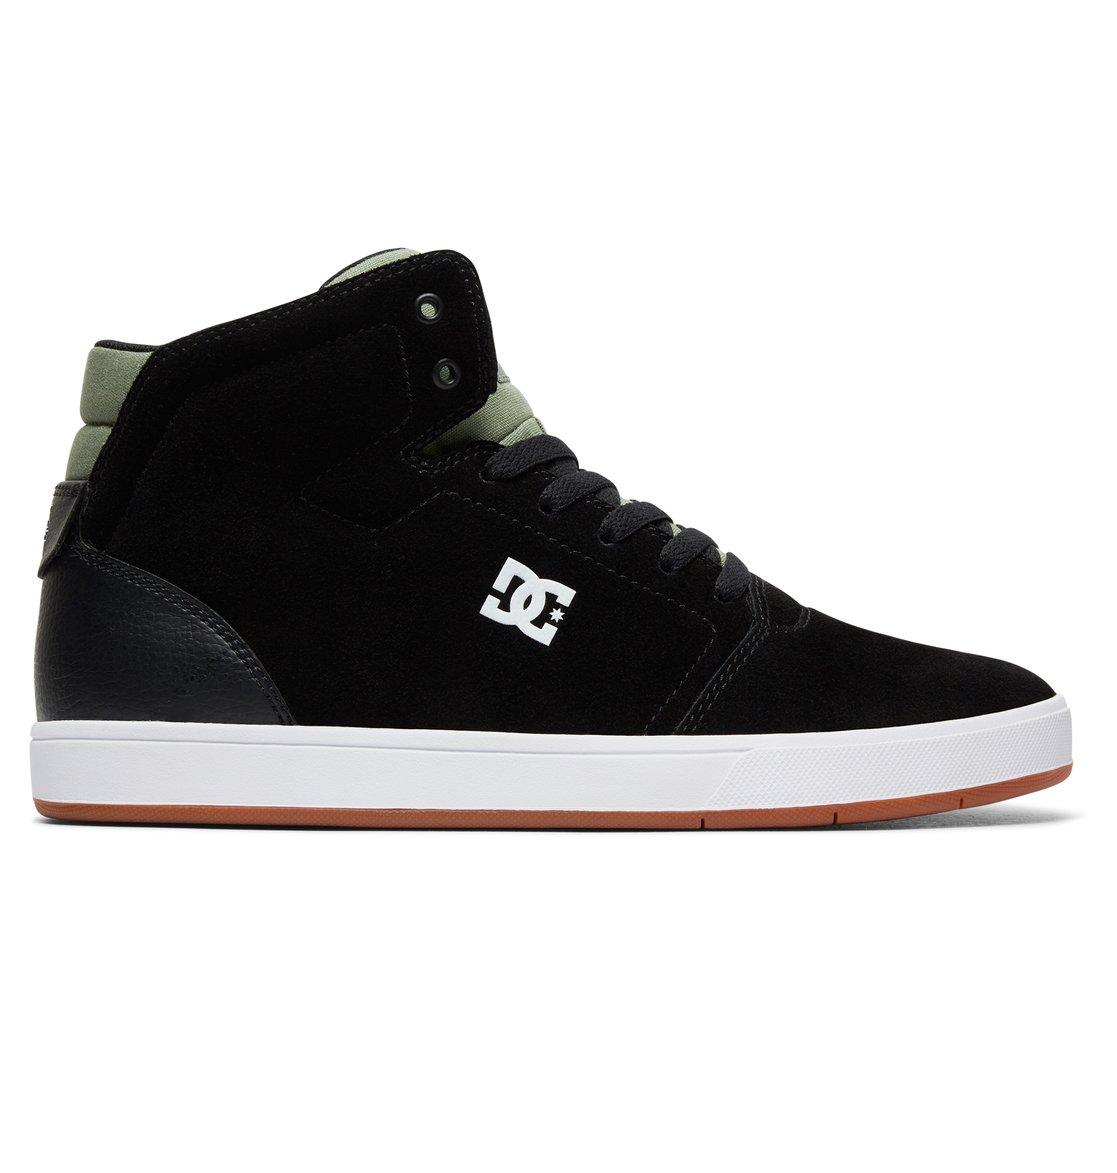 dc shoes Crisis - Scarpe alte da Uomo - Black - DC Shoes tBEMvfU